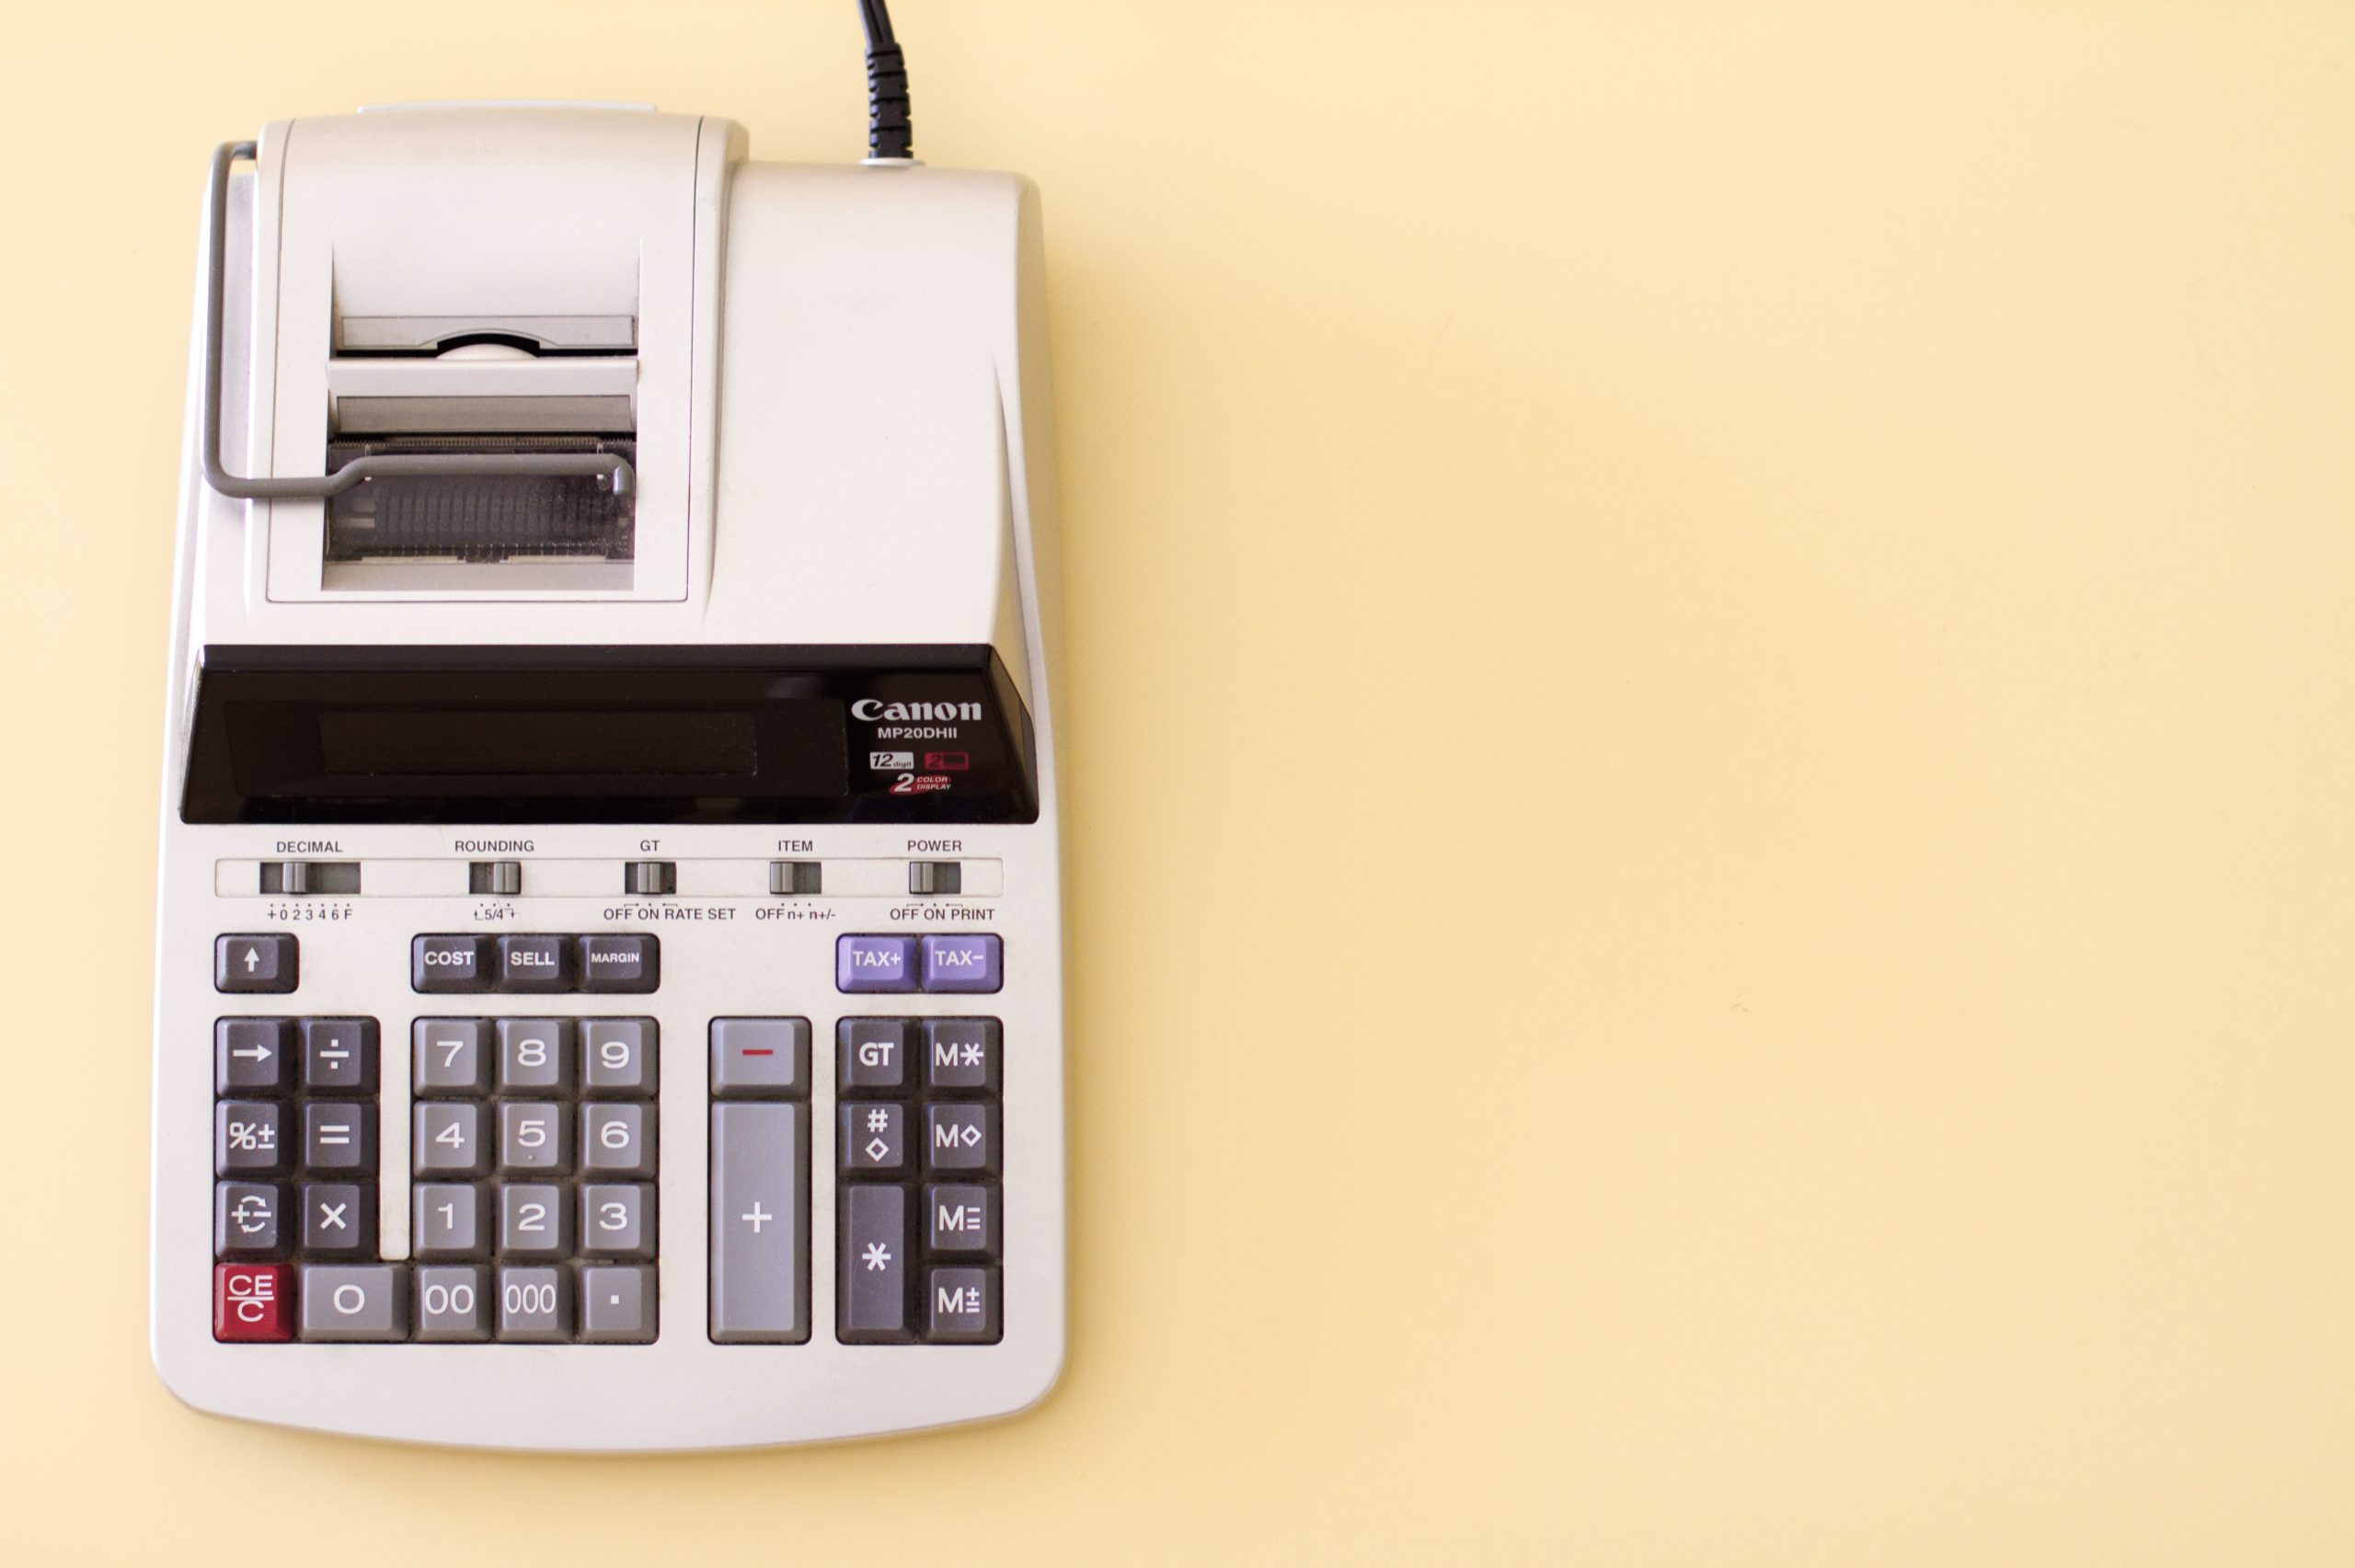 Buy to let mortgage calculator (20% deposit)